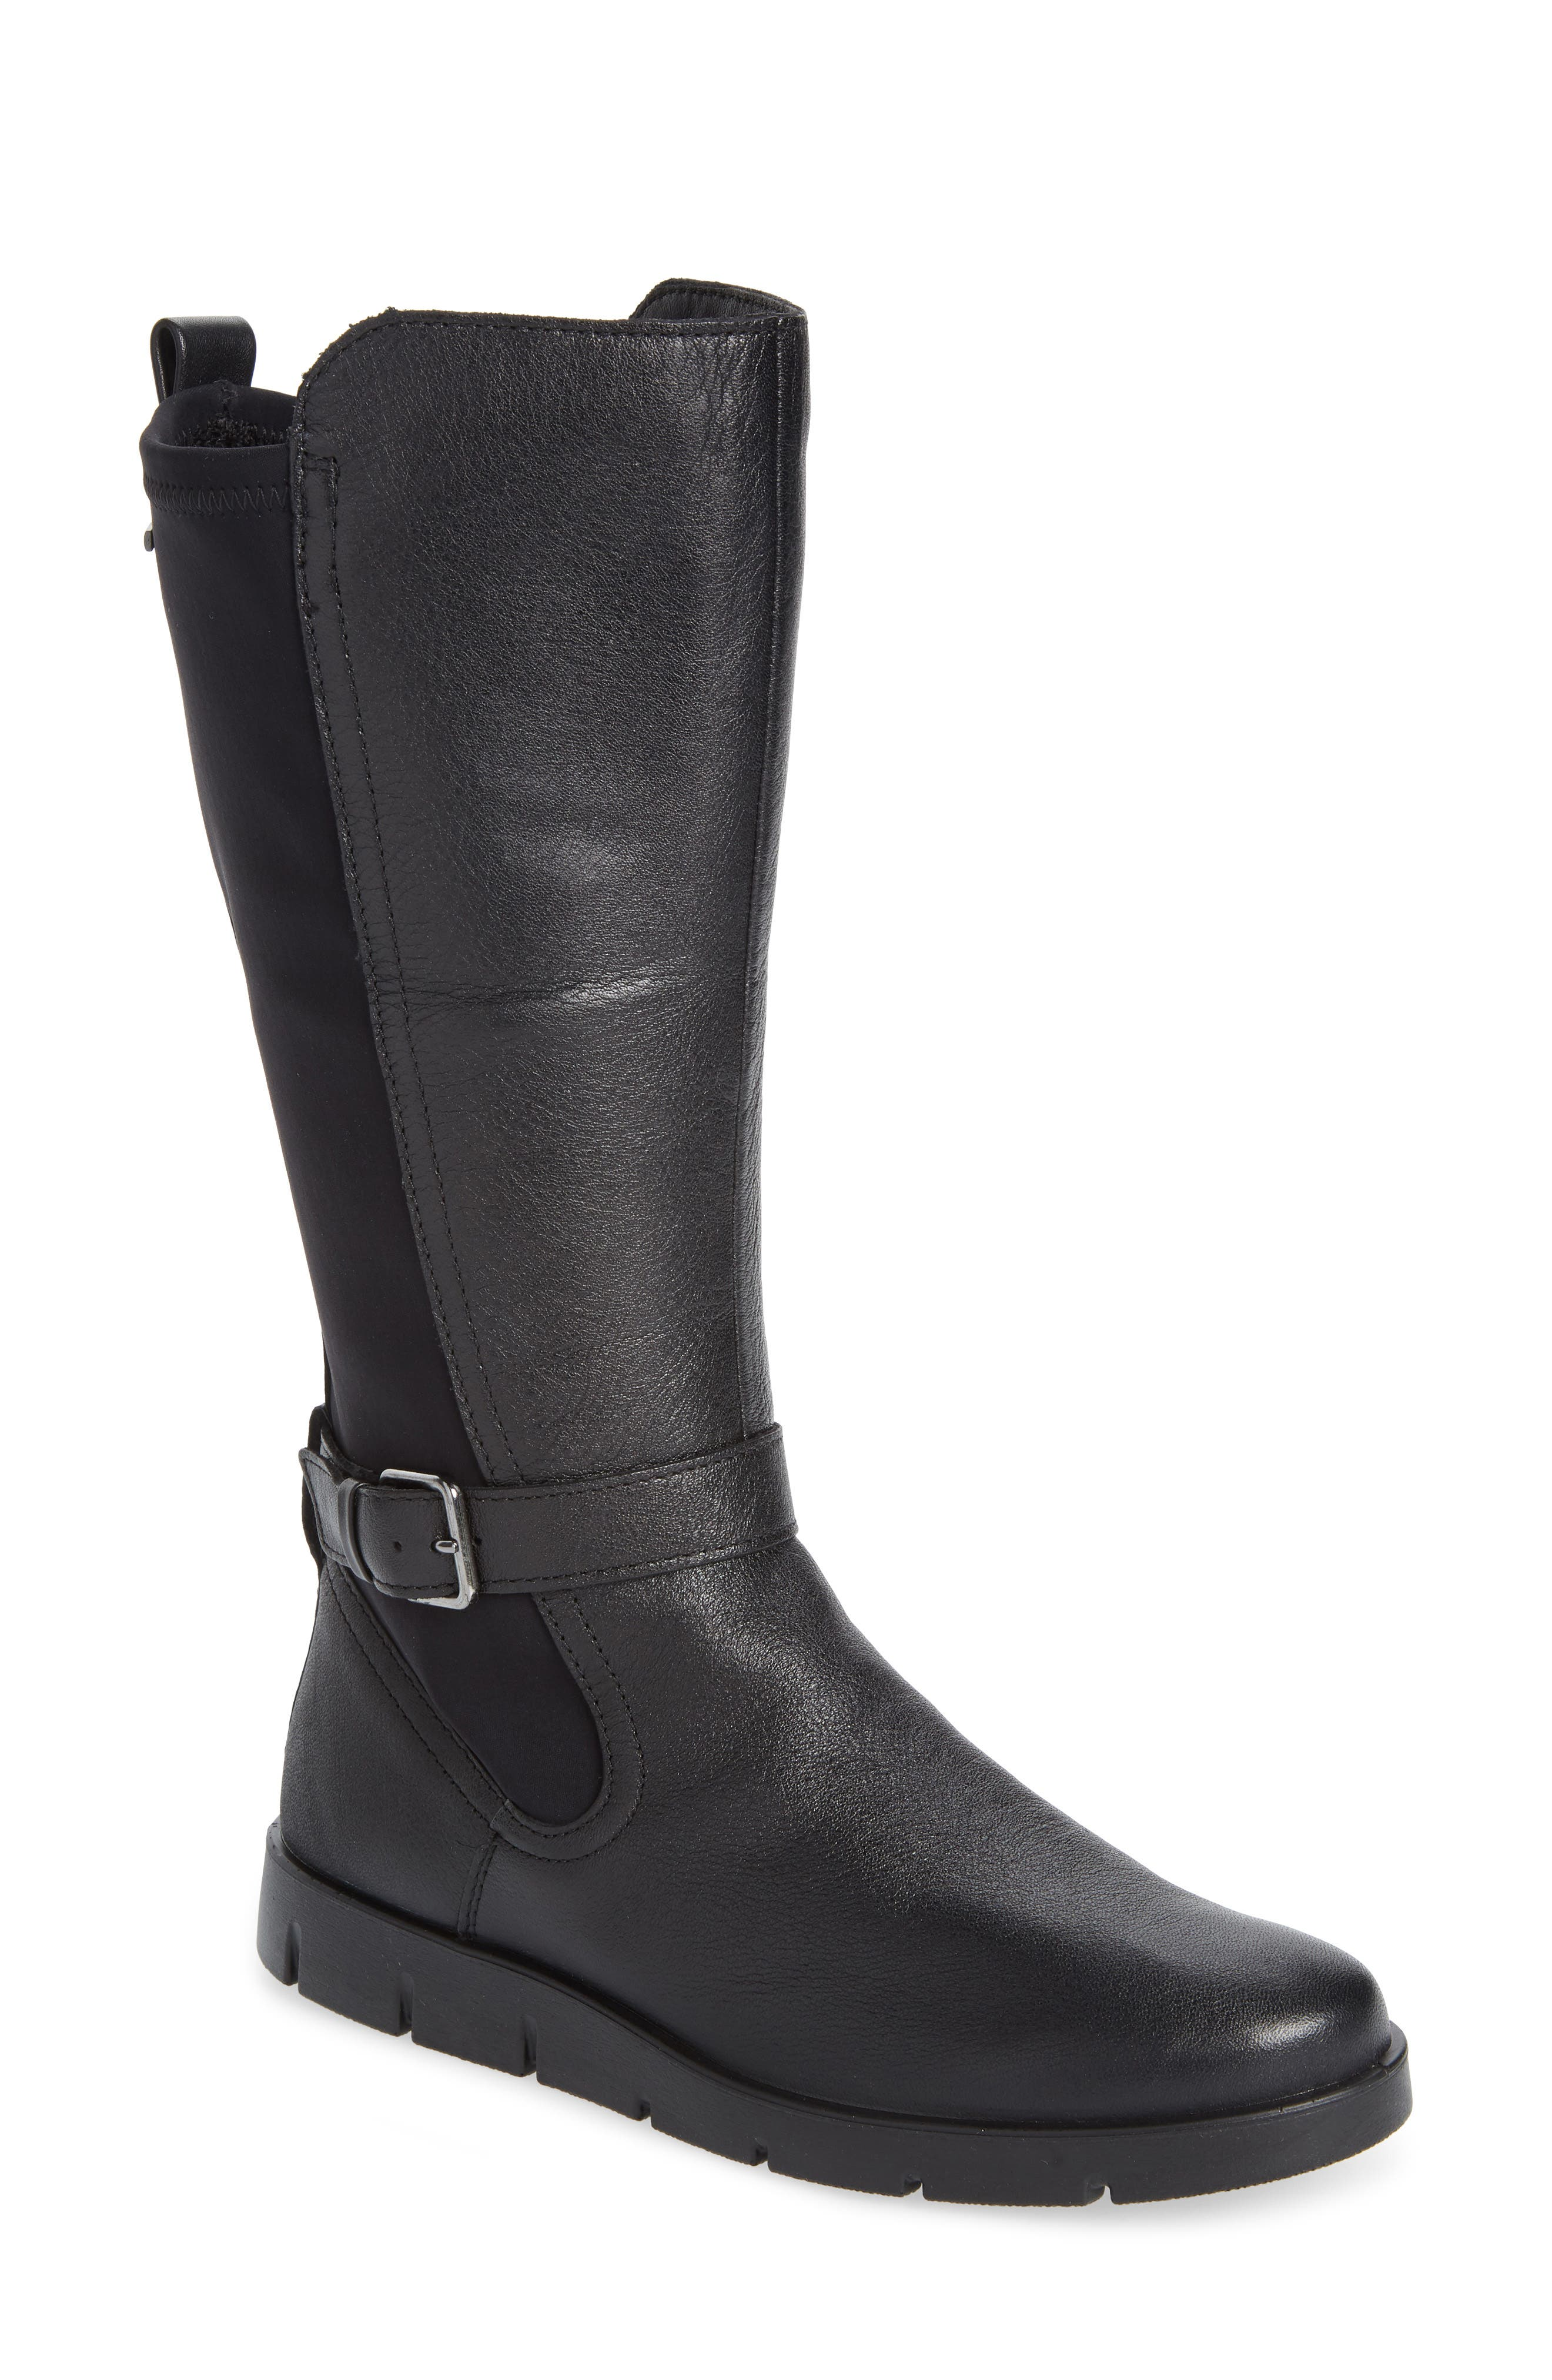 3865619180f4 tall riding boots